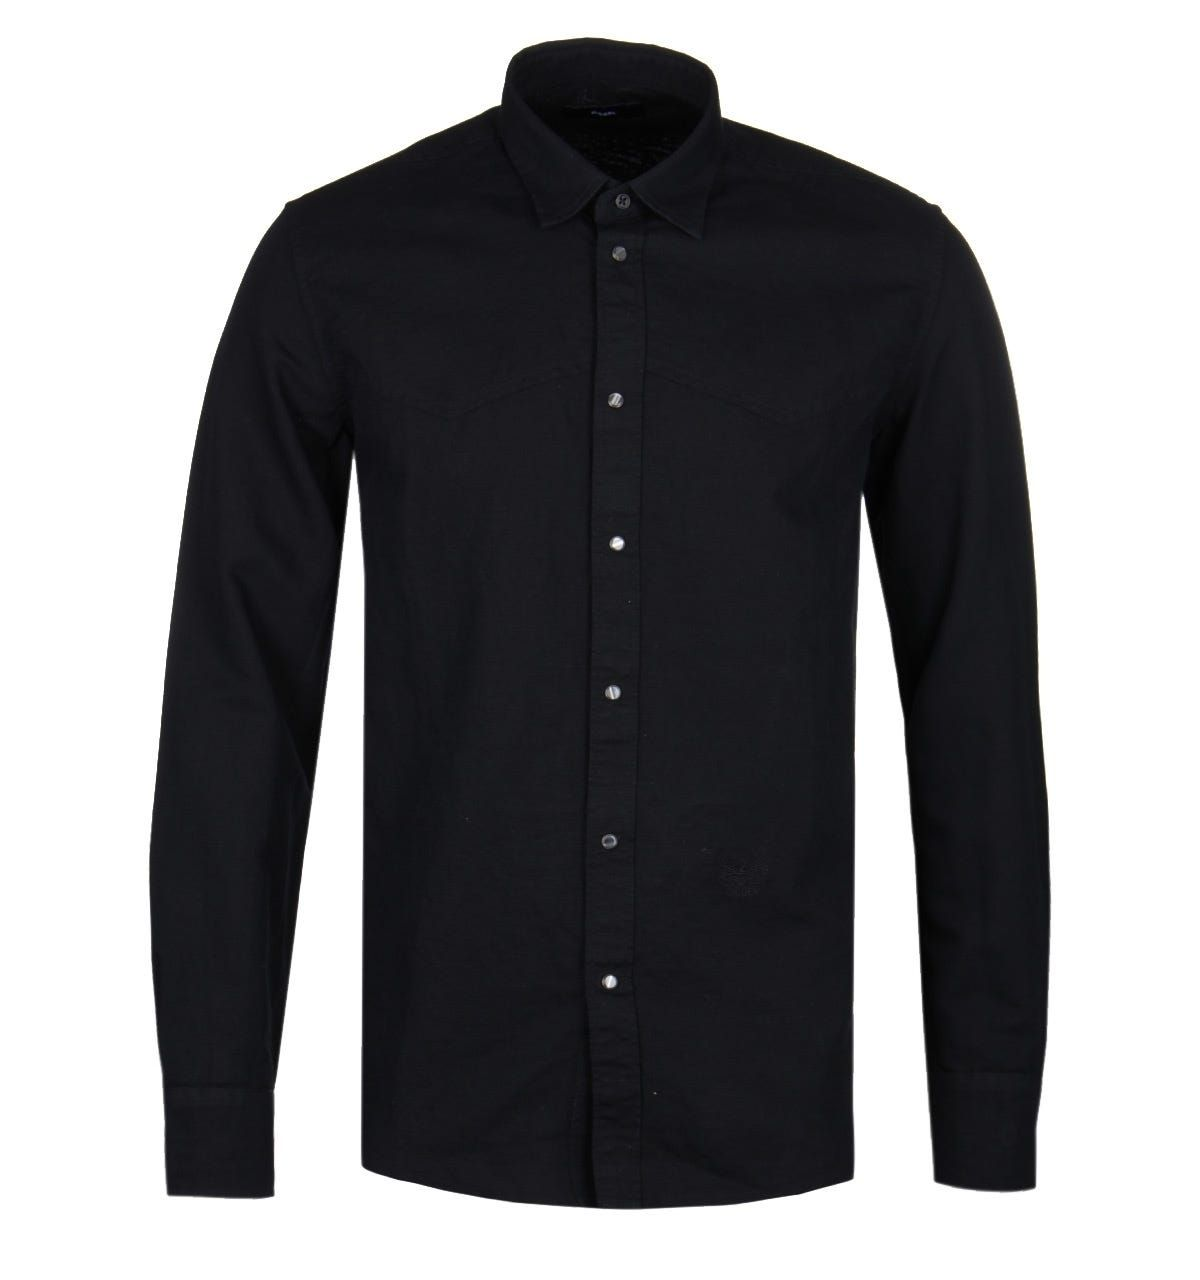 Diesel S-Plan Black Shirt